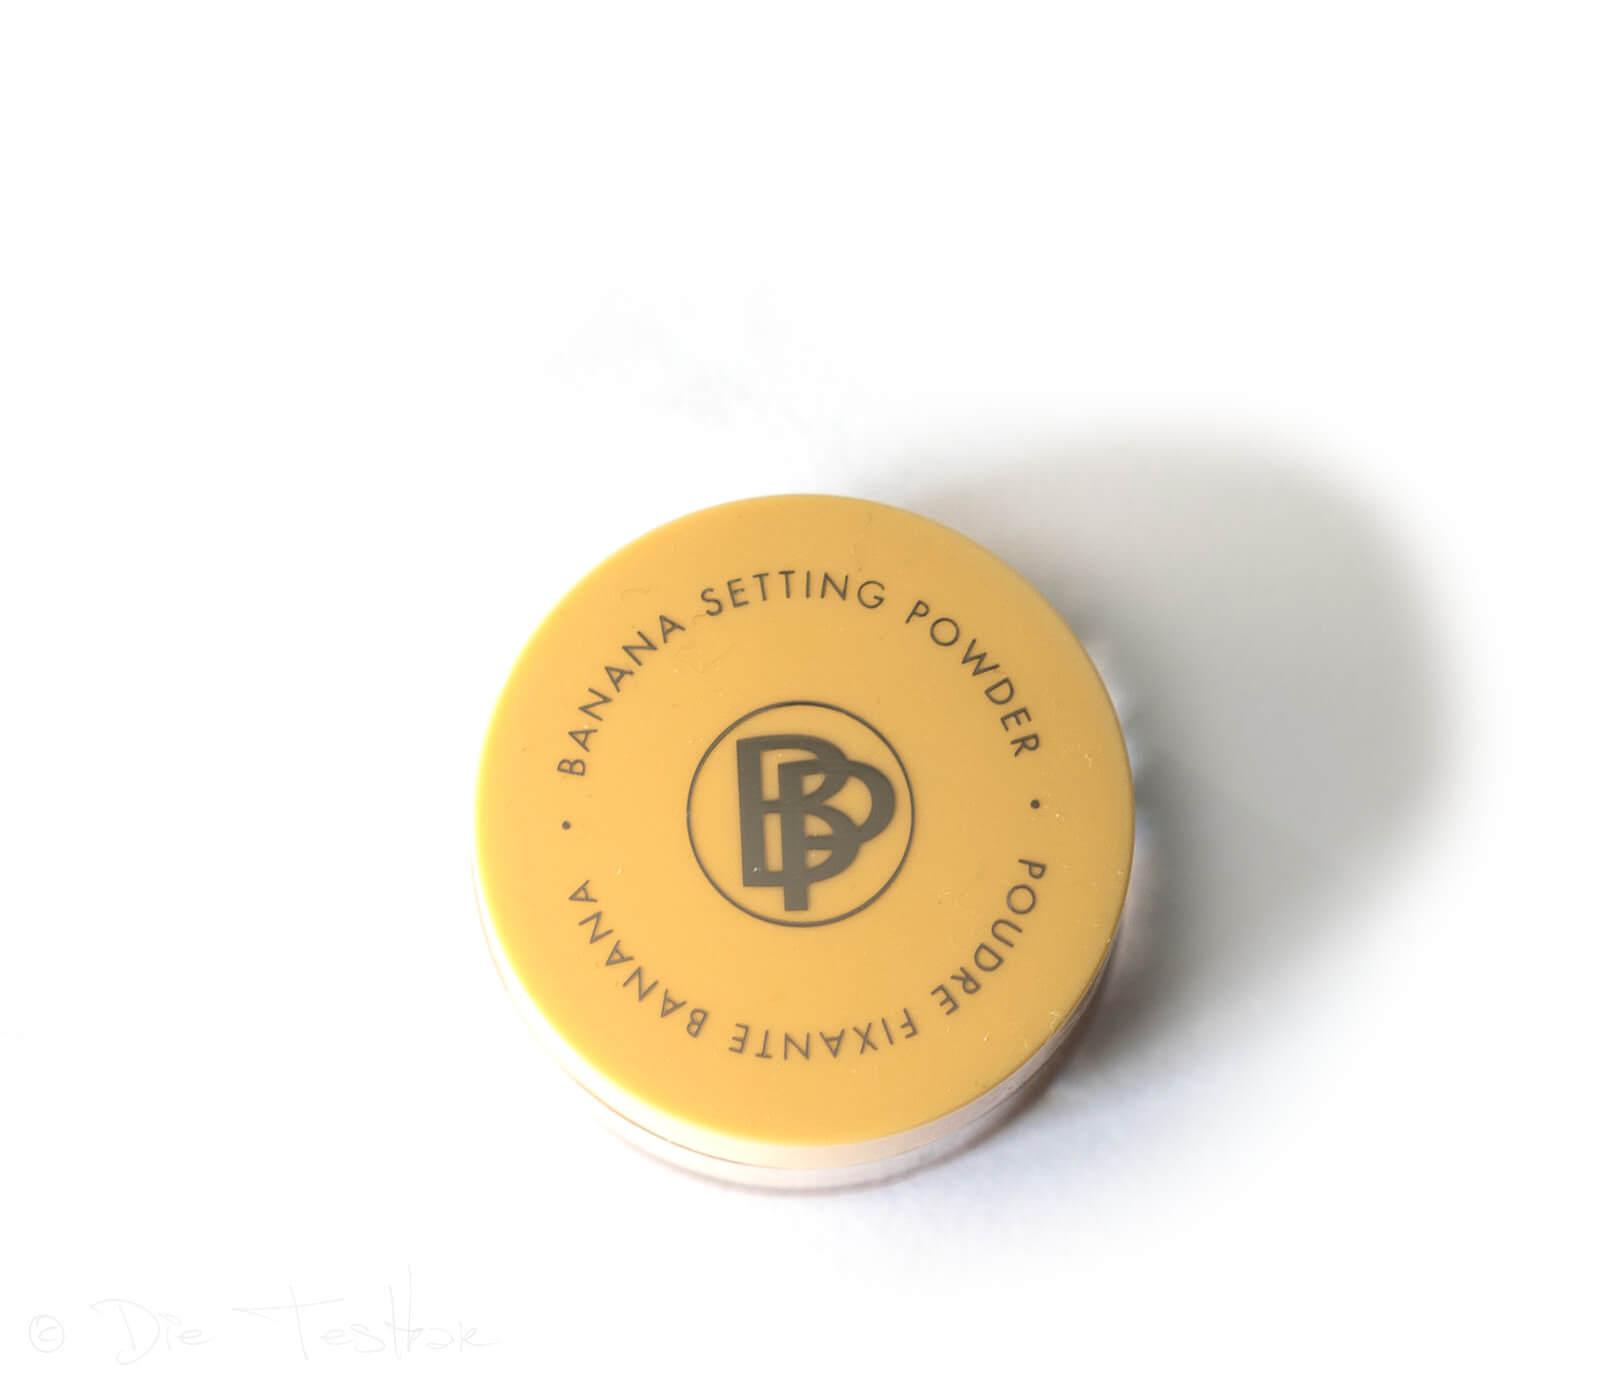 Bellapierre - Banana Setting Powder